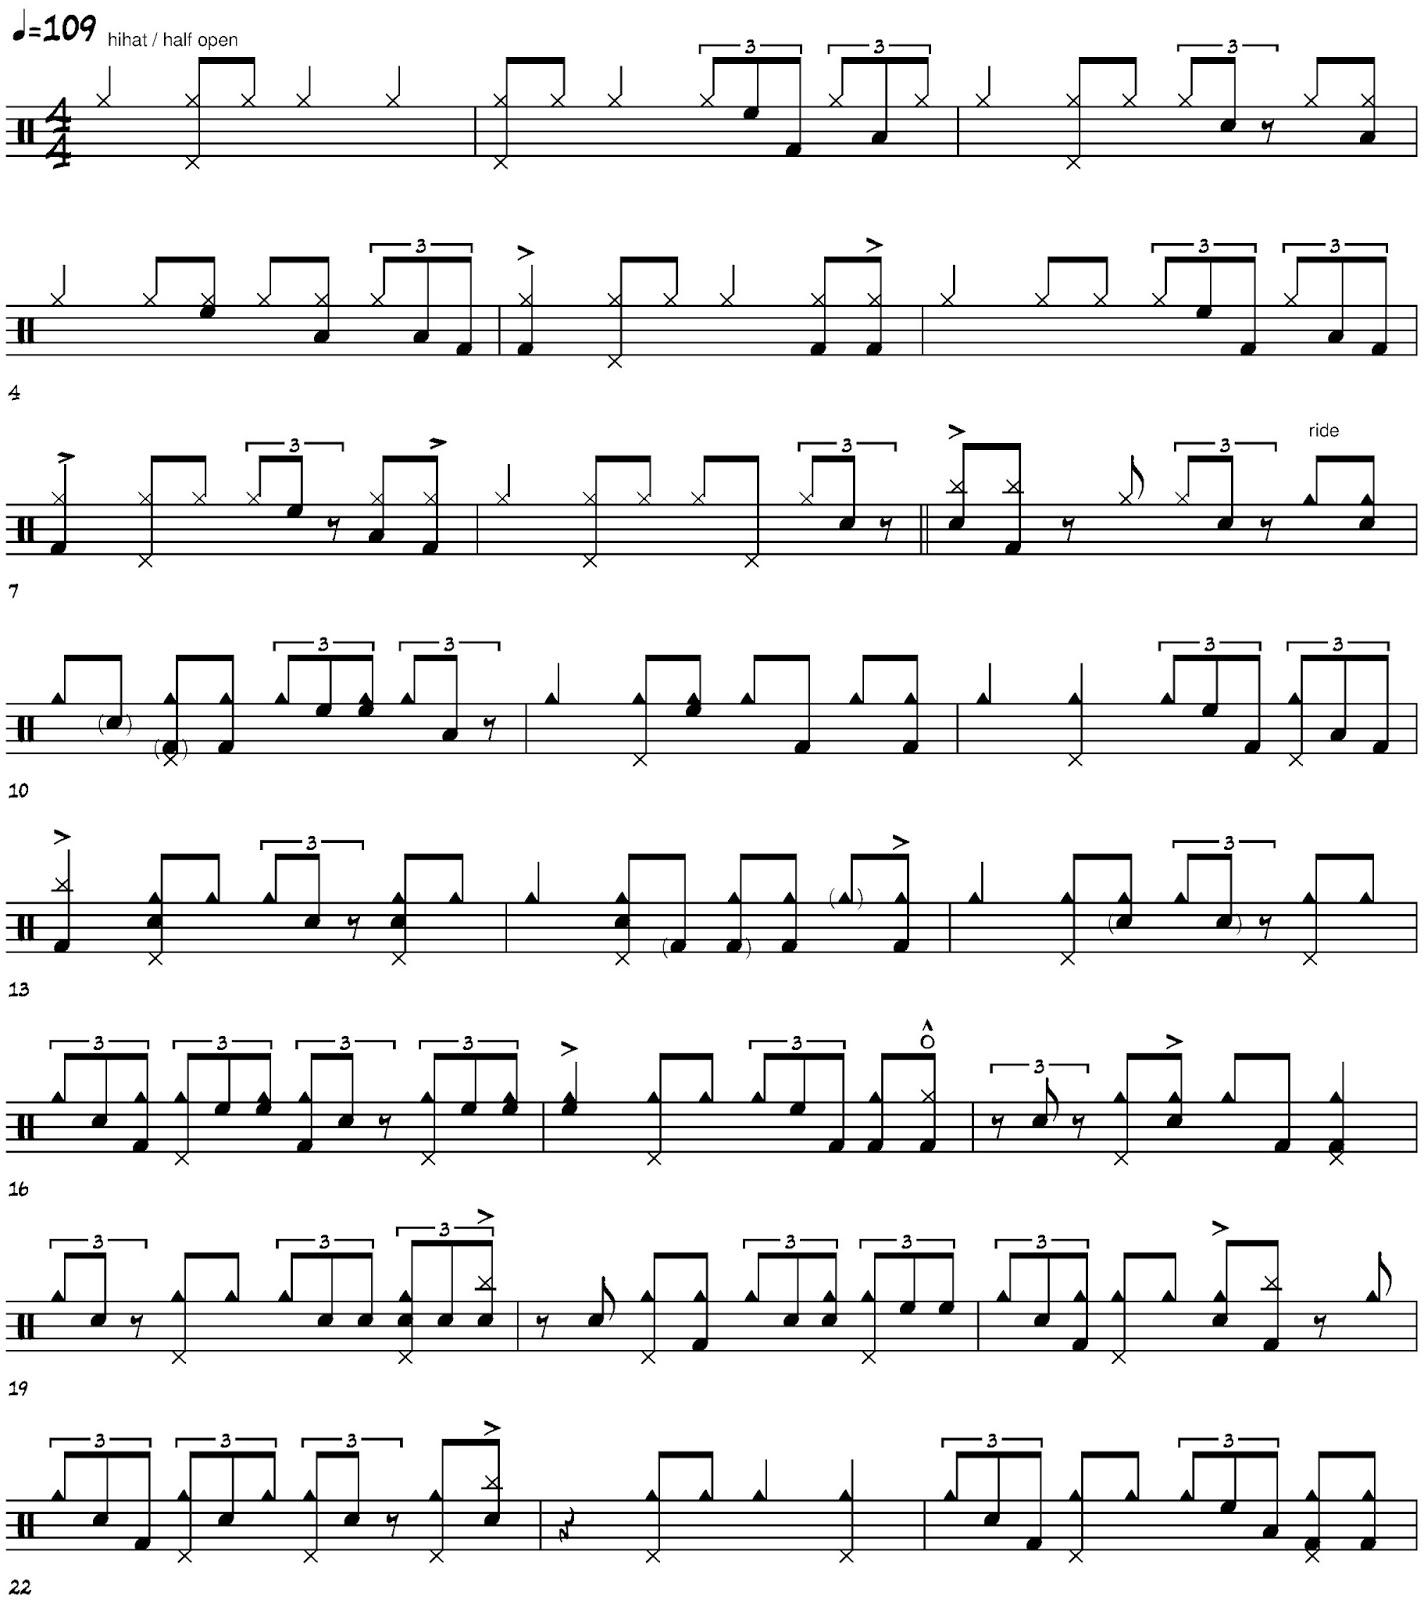 Cruise Ship Drummer!: Elvin Jones transcription - Tunji by John Coltrane